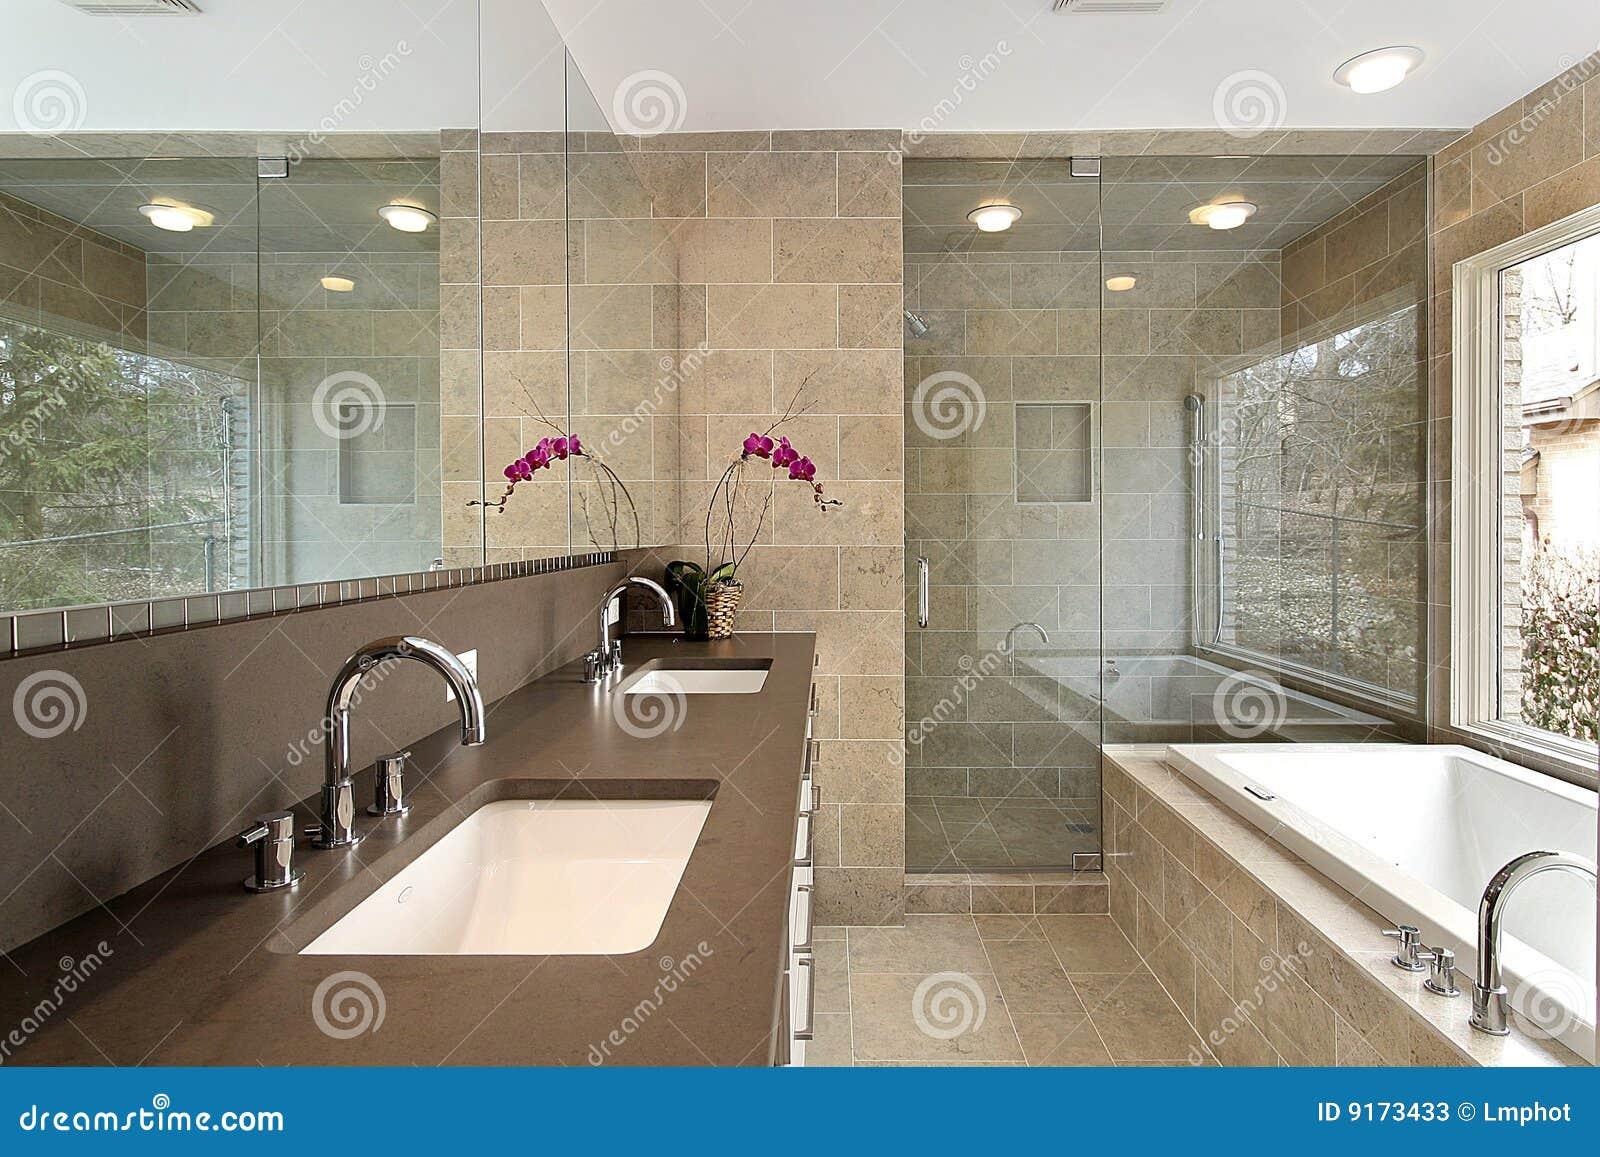 Master Bath In Luxury Home Stock Photos - Image: 9173433